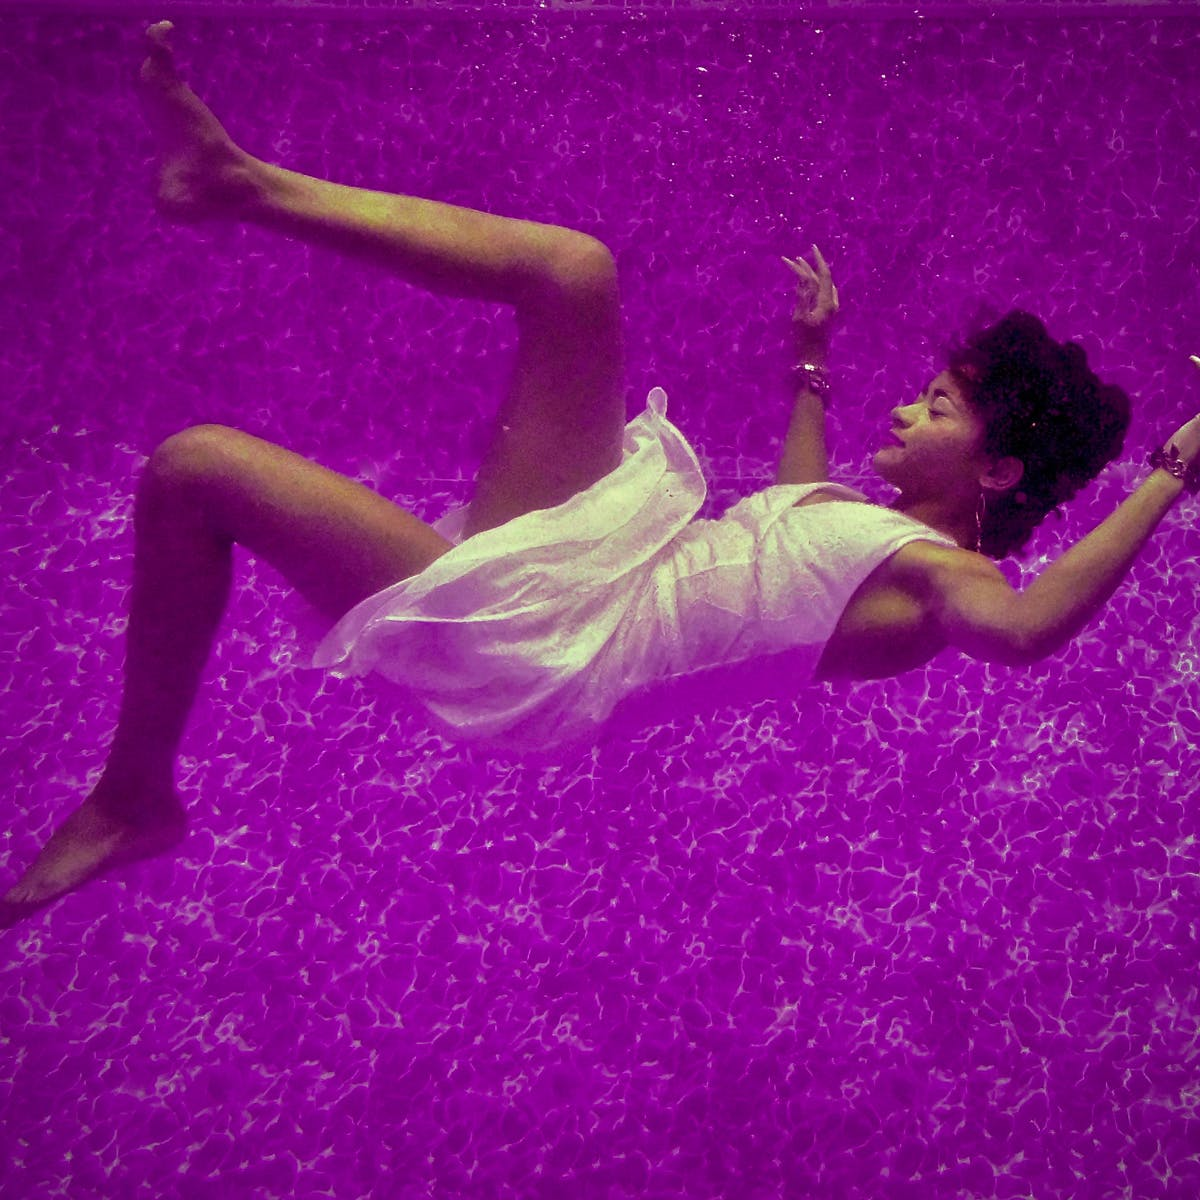 Sleep Researcher Explains Link Between Lucid Dreaming, Nightmares, and PTSD